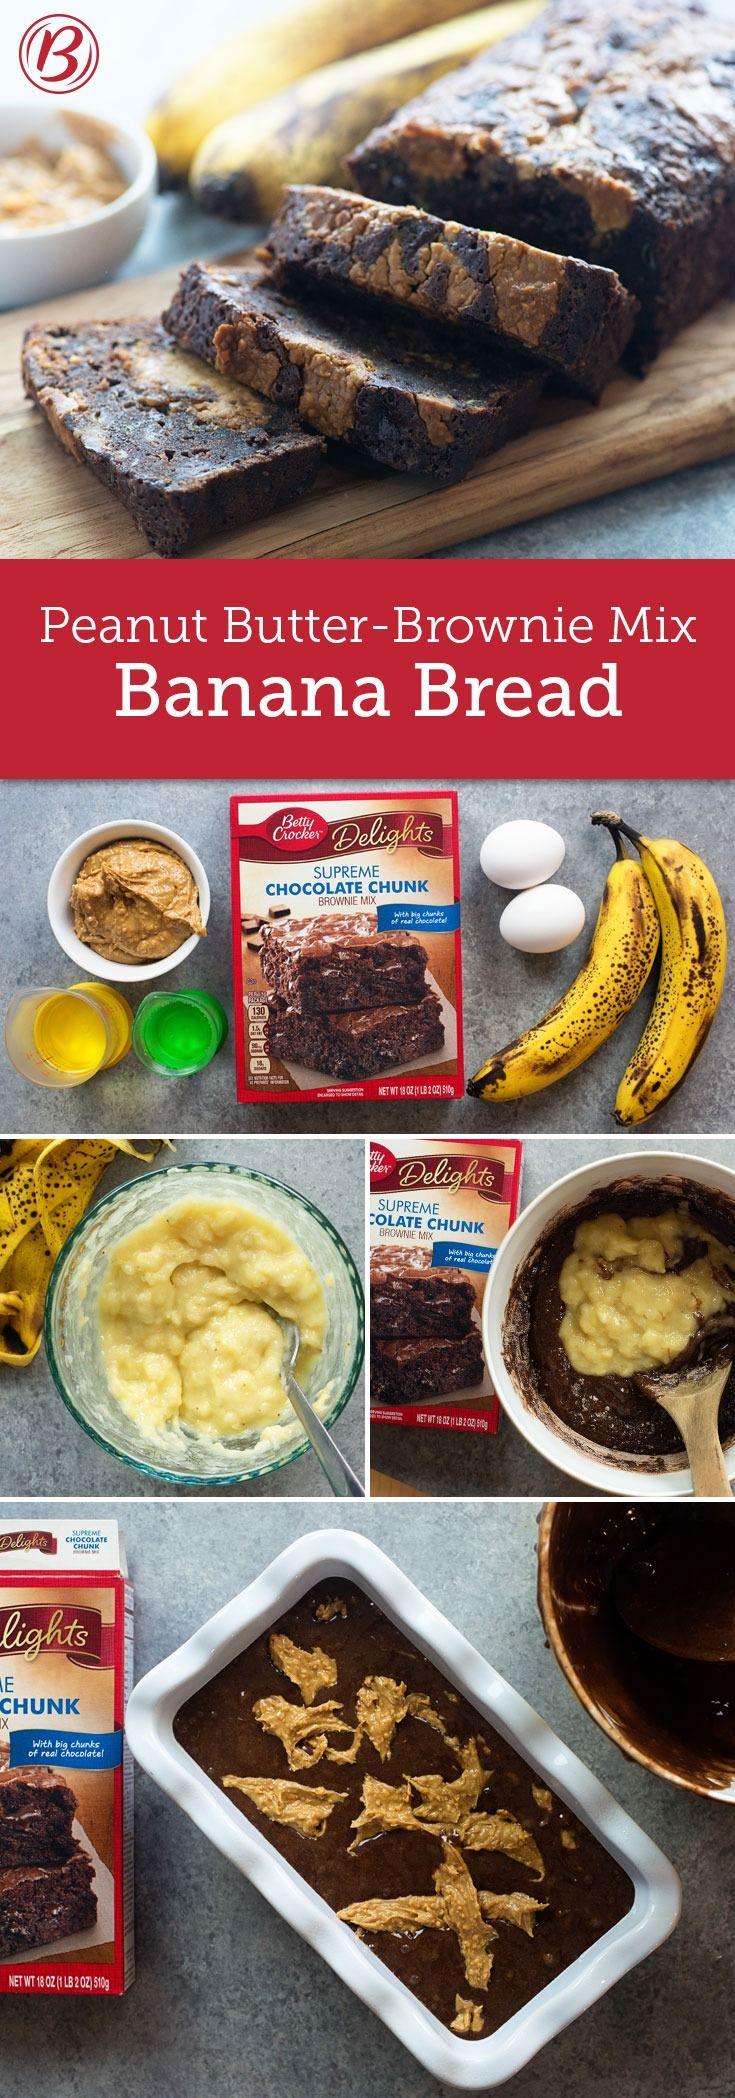 Peanut Butter-Brownie Mix Banana Bread